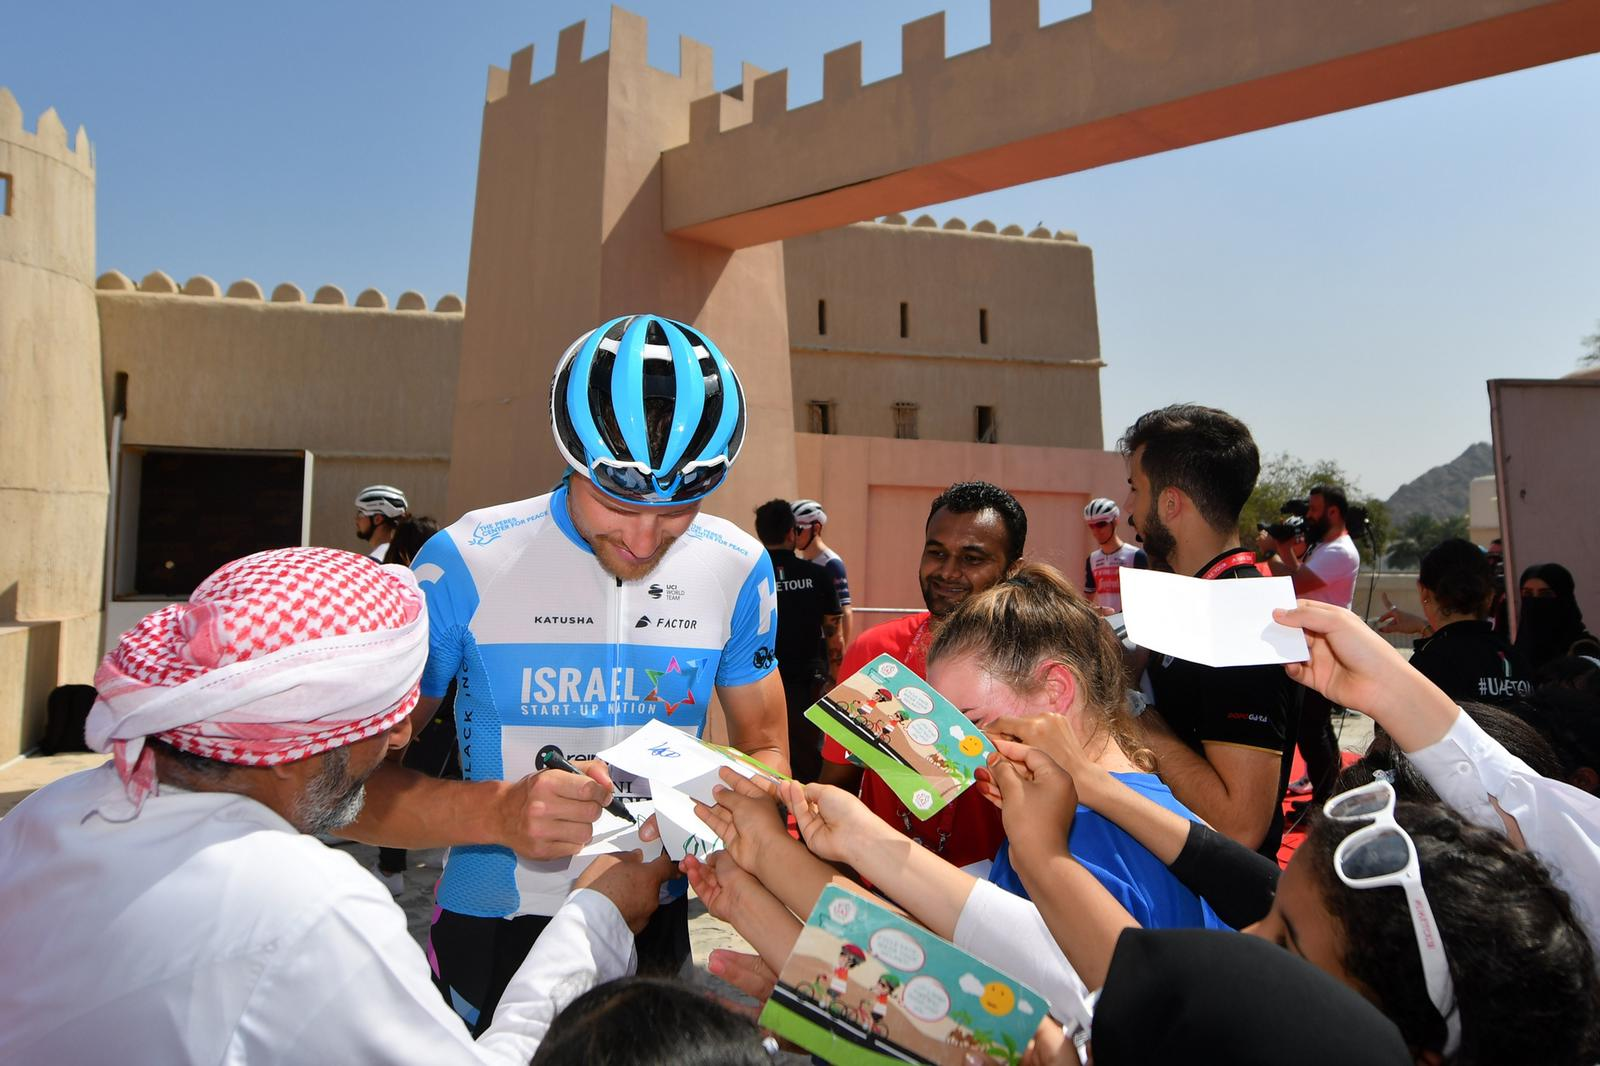 Returning to the UAE Tour